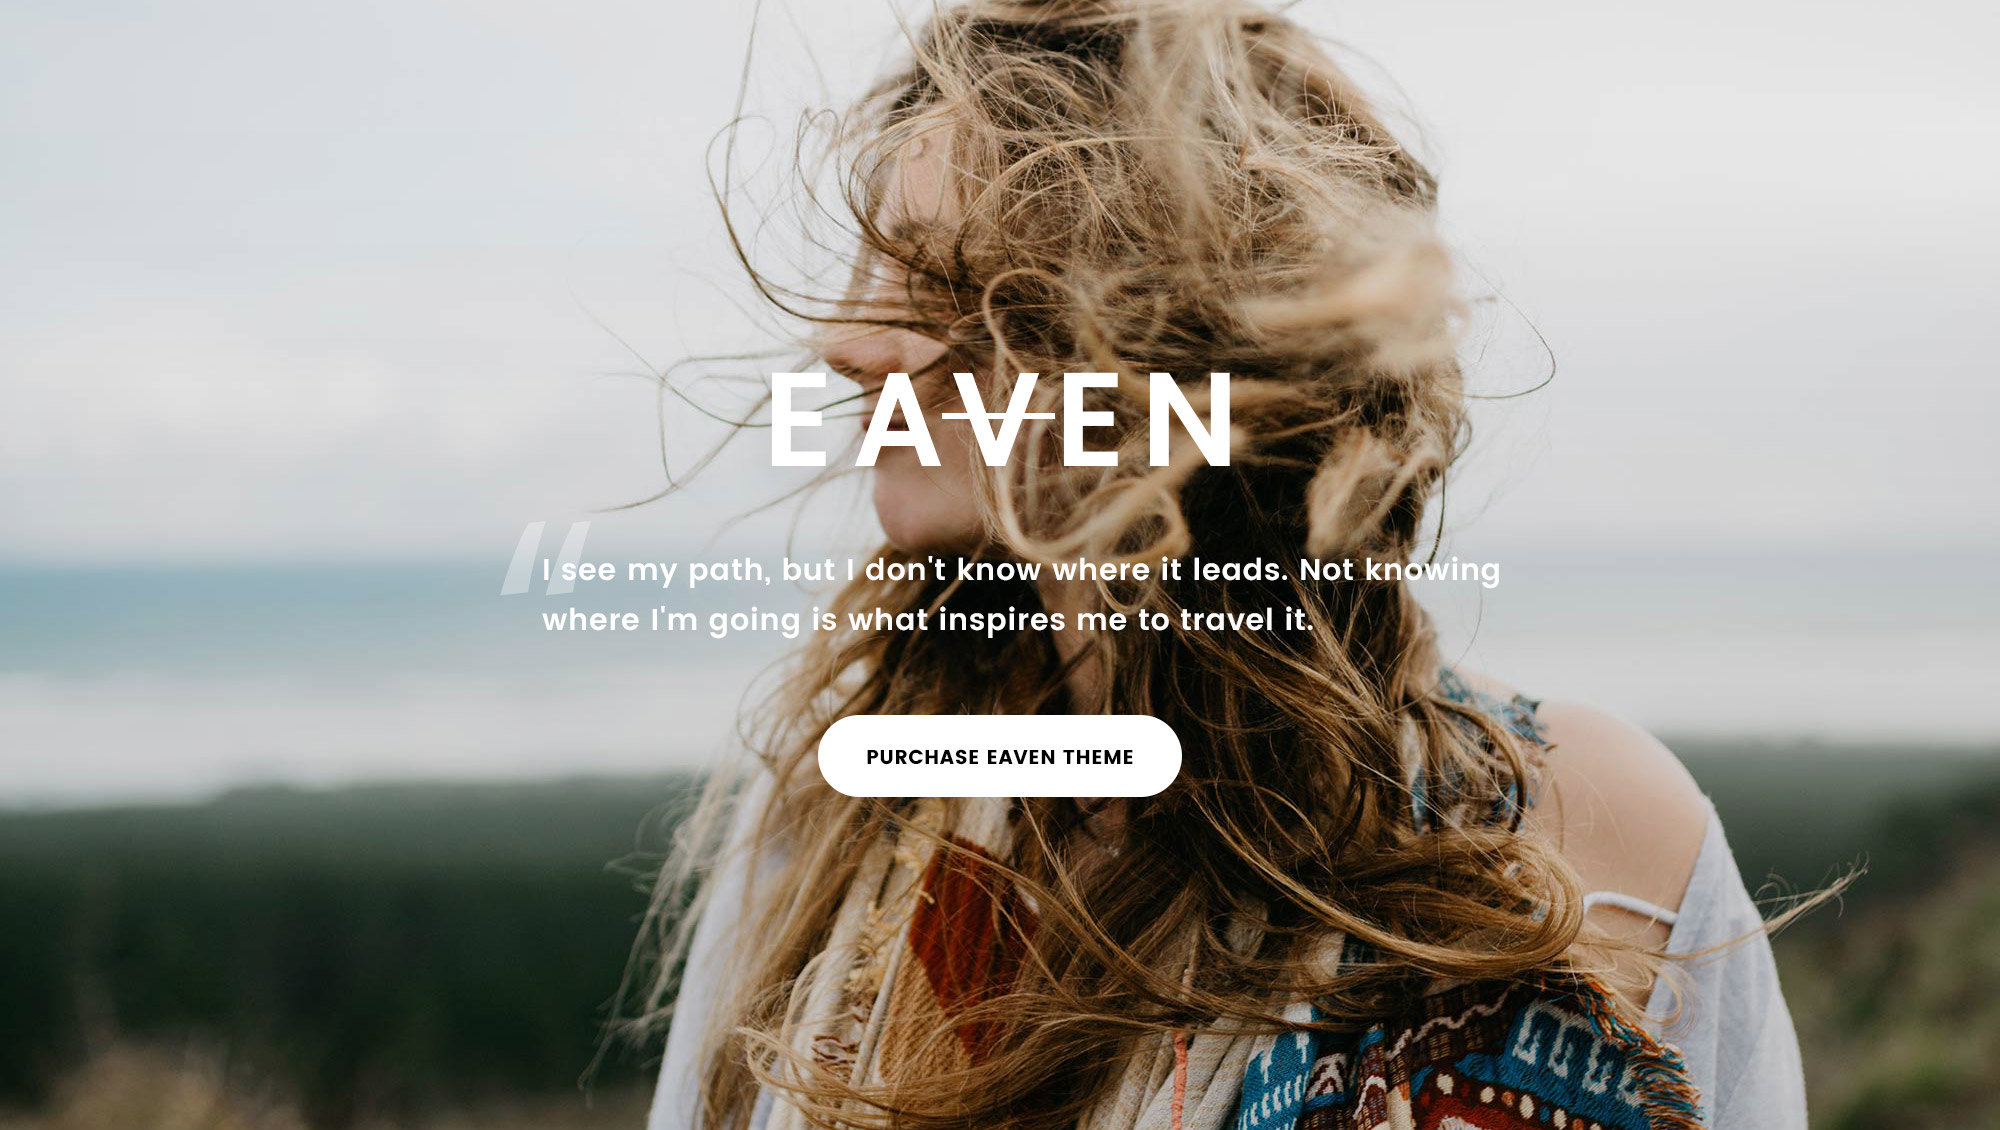 eaven-large-promo-2